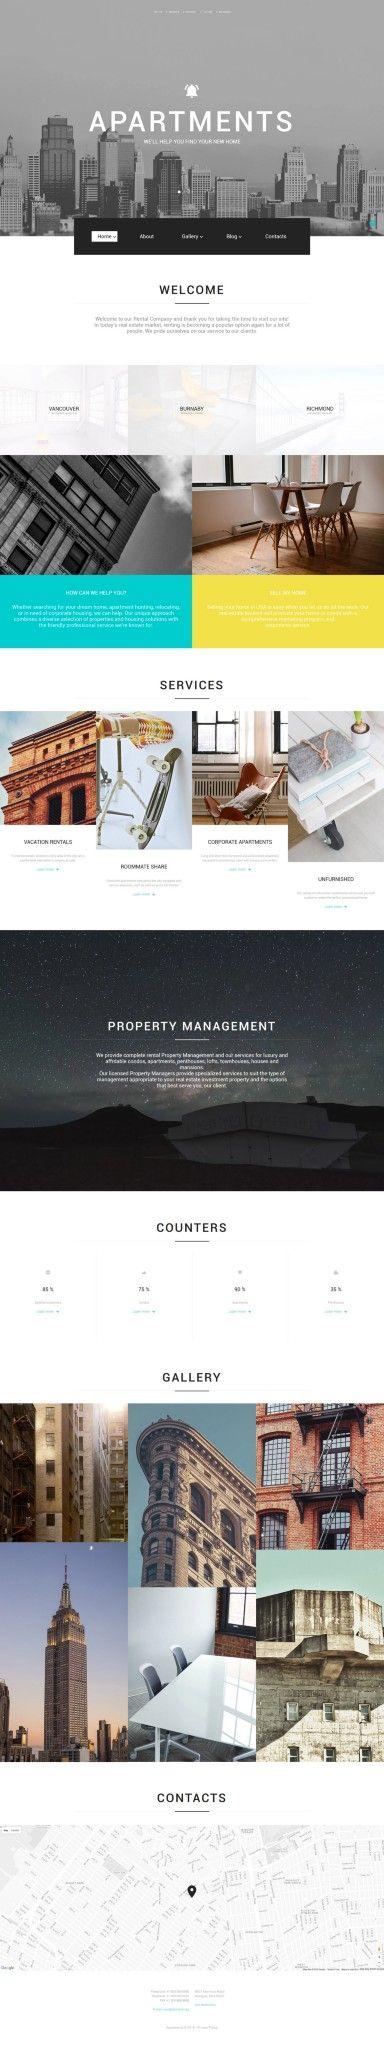 Pin By Miri Soji On Web Design Real Estate Web Inspiration Real Estate Website